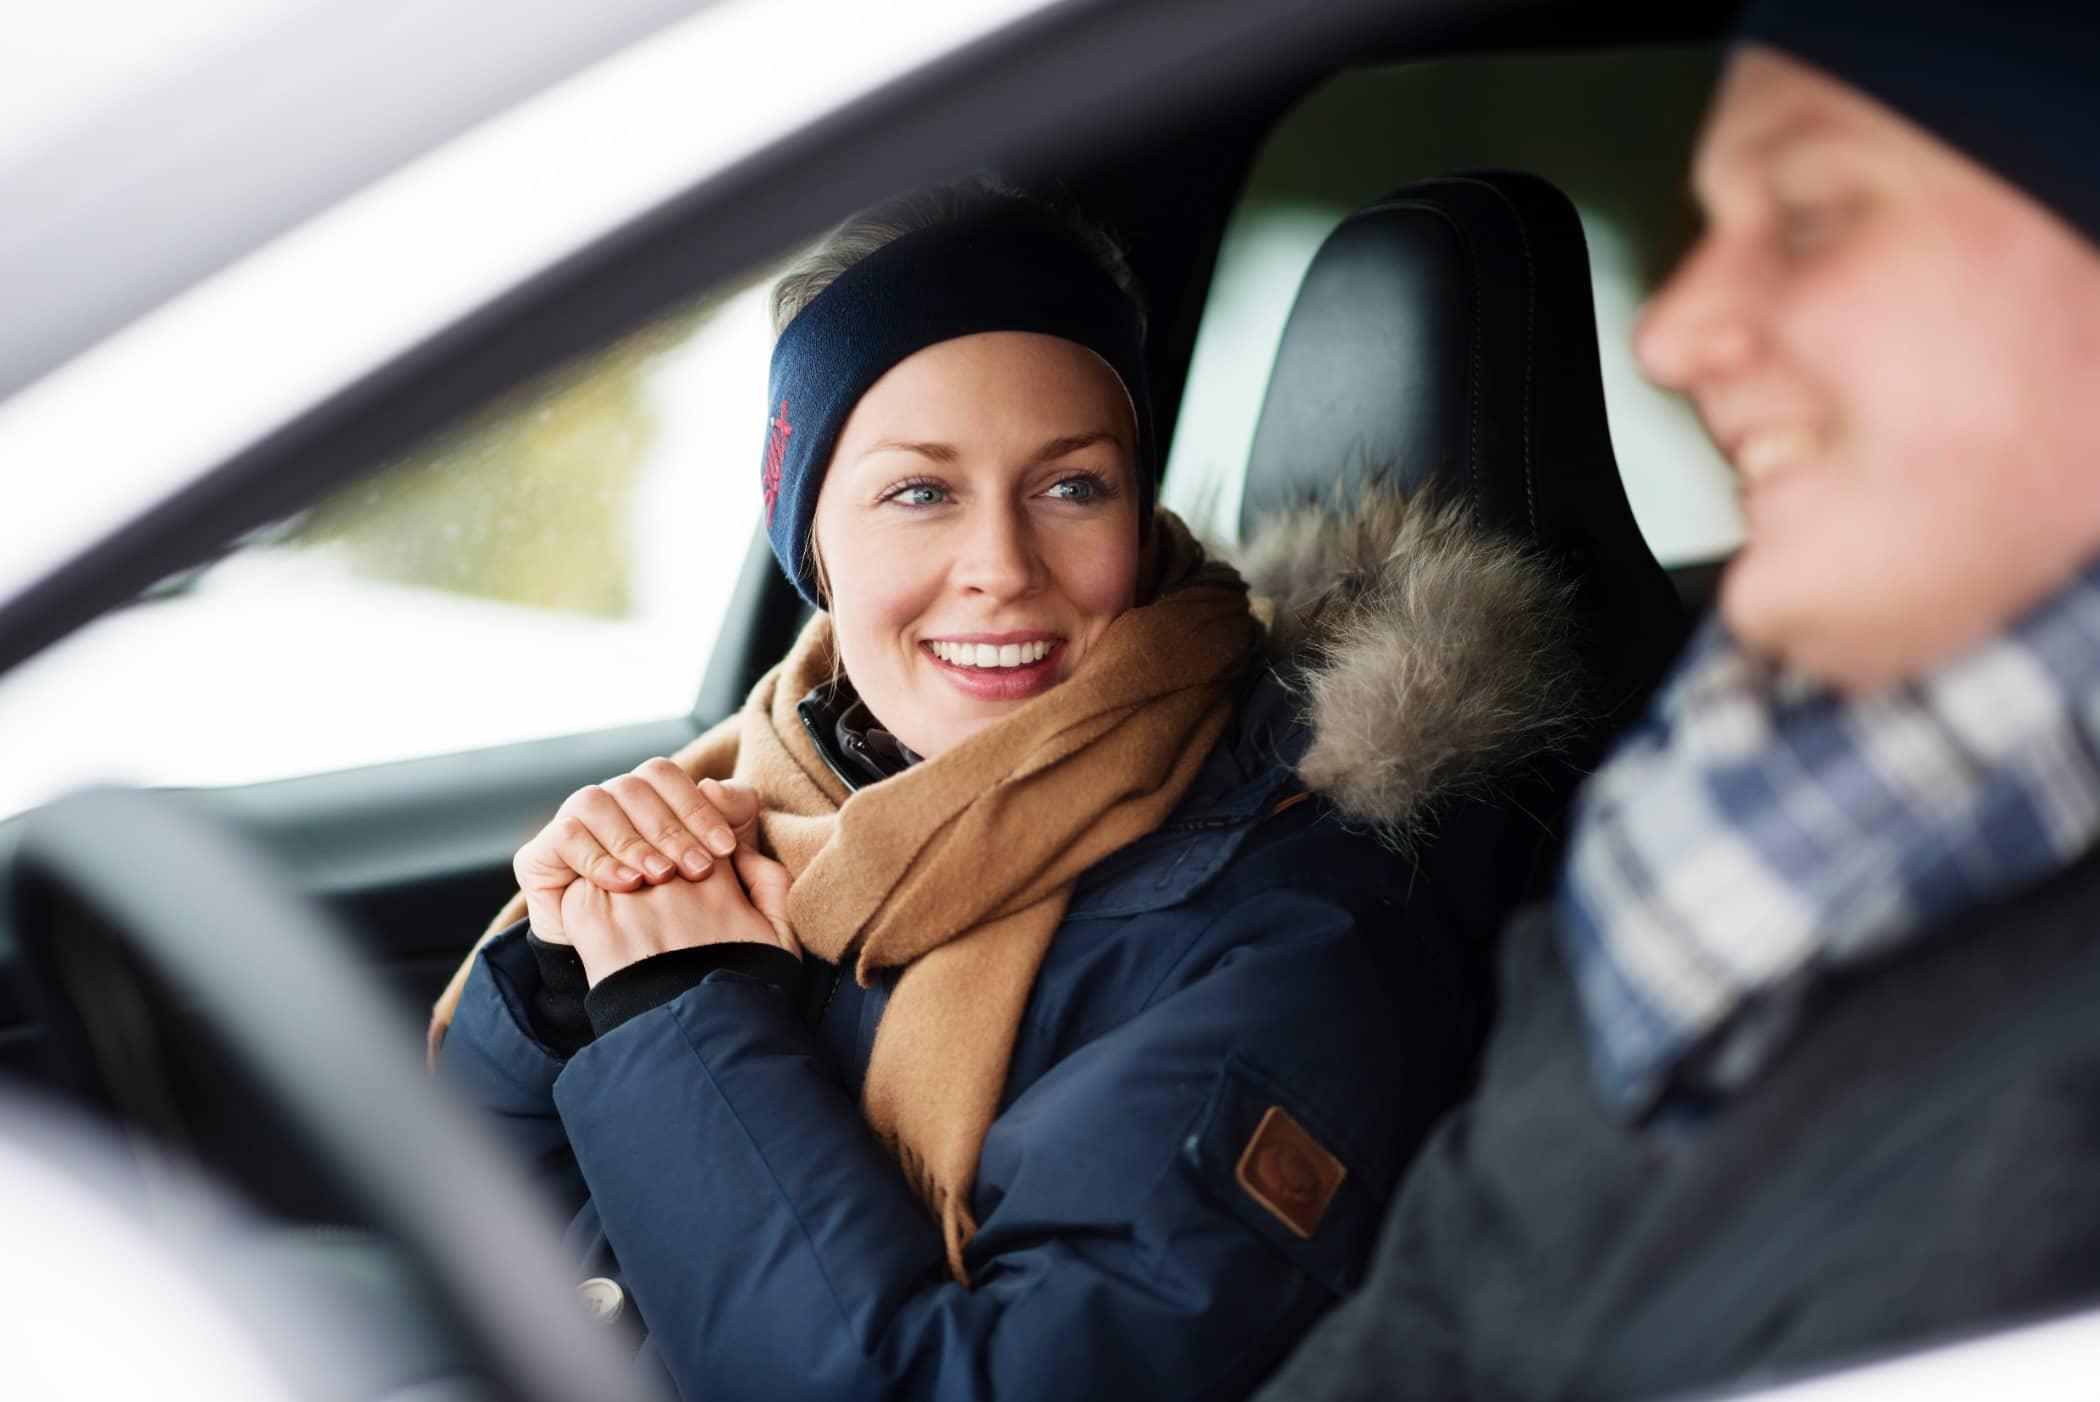 Automotive design, Luxury vehicle, Smile, Driving